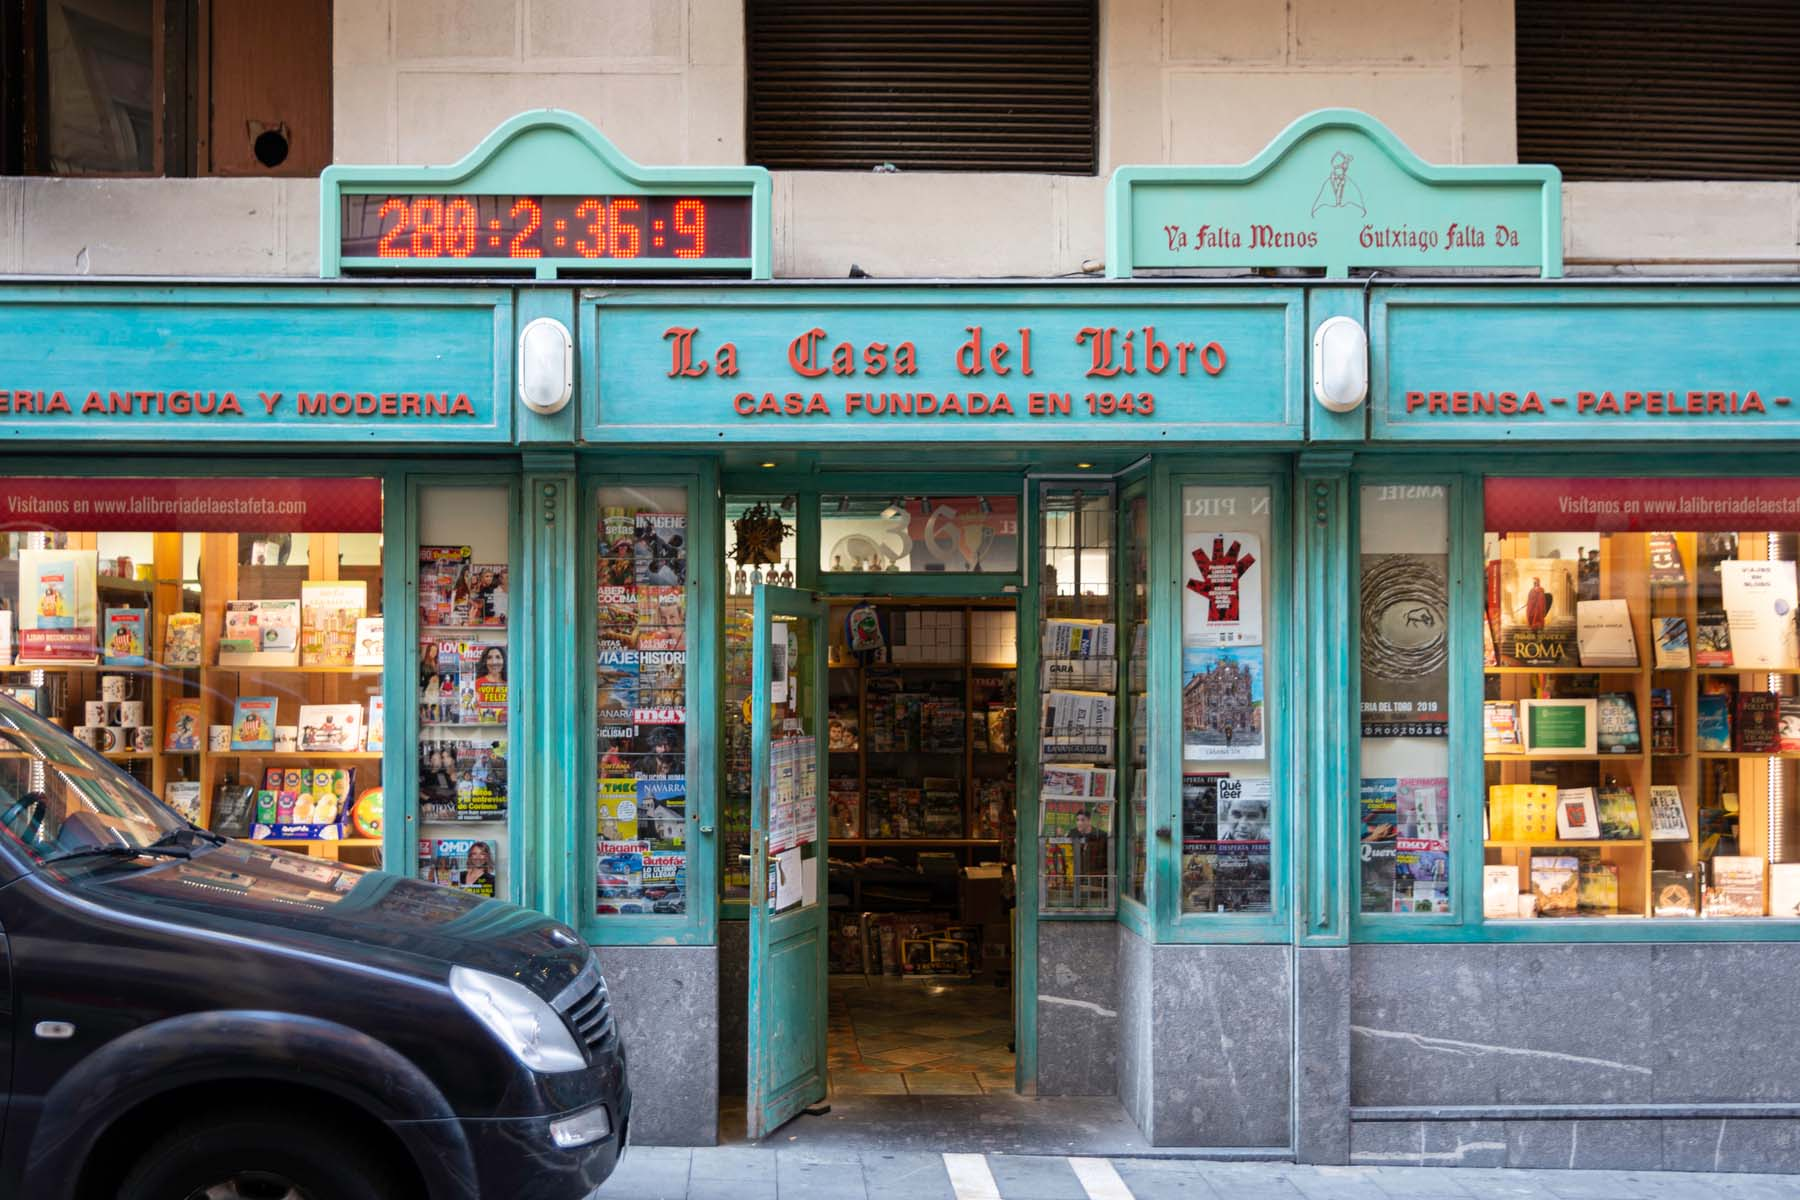 Bookstore in Spain